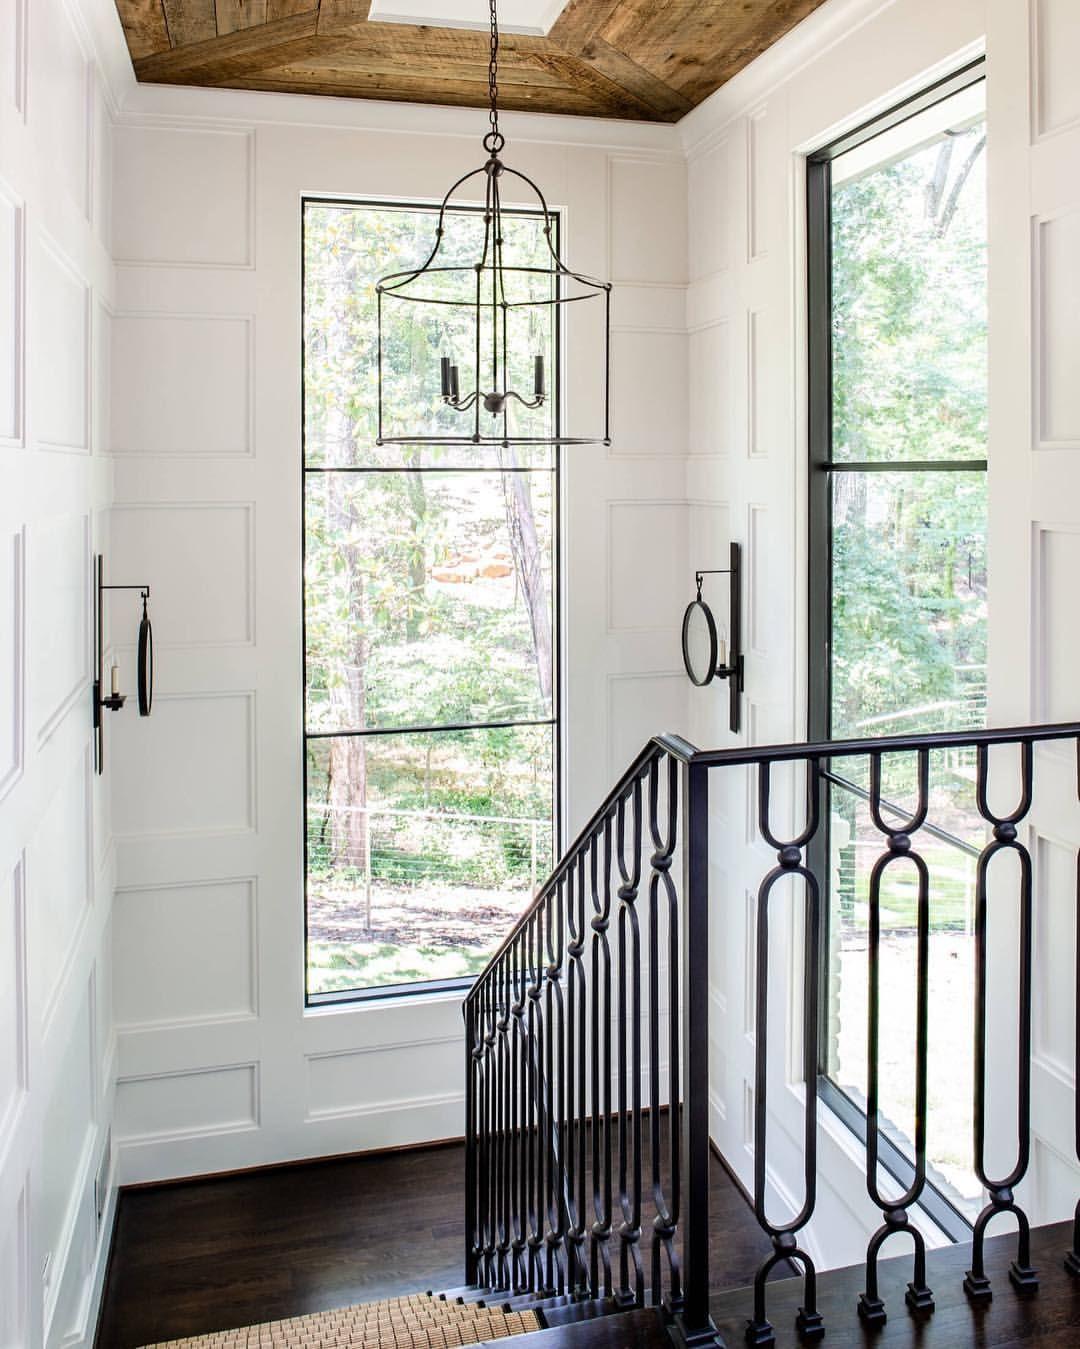 80 Awesome Modern Farmhouse Staircase Decor Ideas: Farmhouse Modern Staircase And Handrail With White